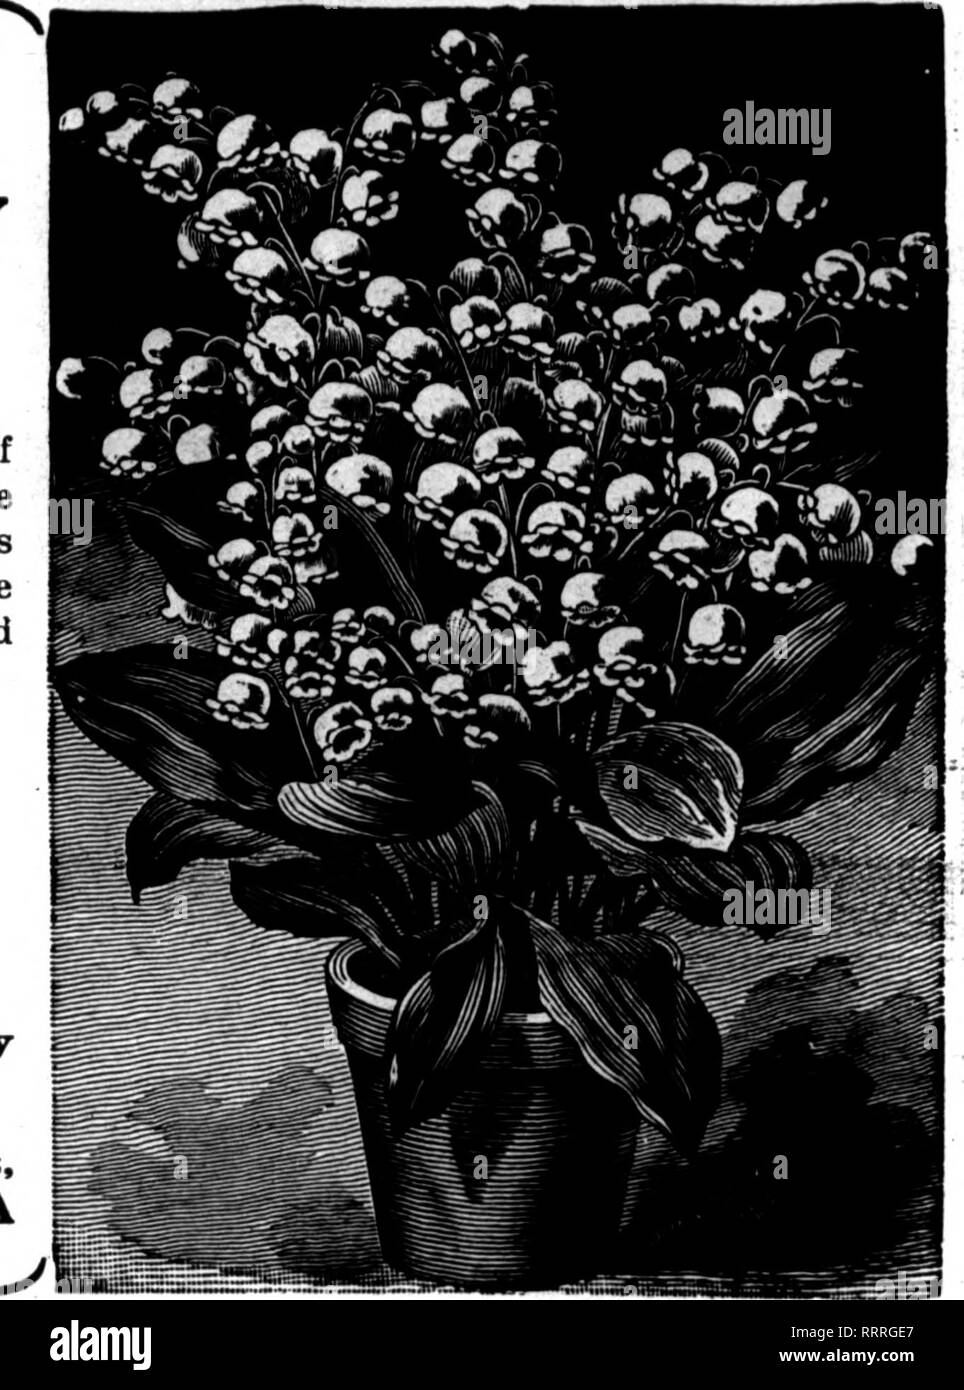 Florists Review Microform Floriculture Fbbbd X 1 1815 Tlic